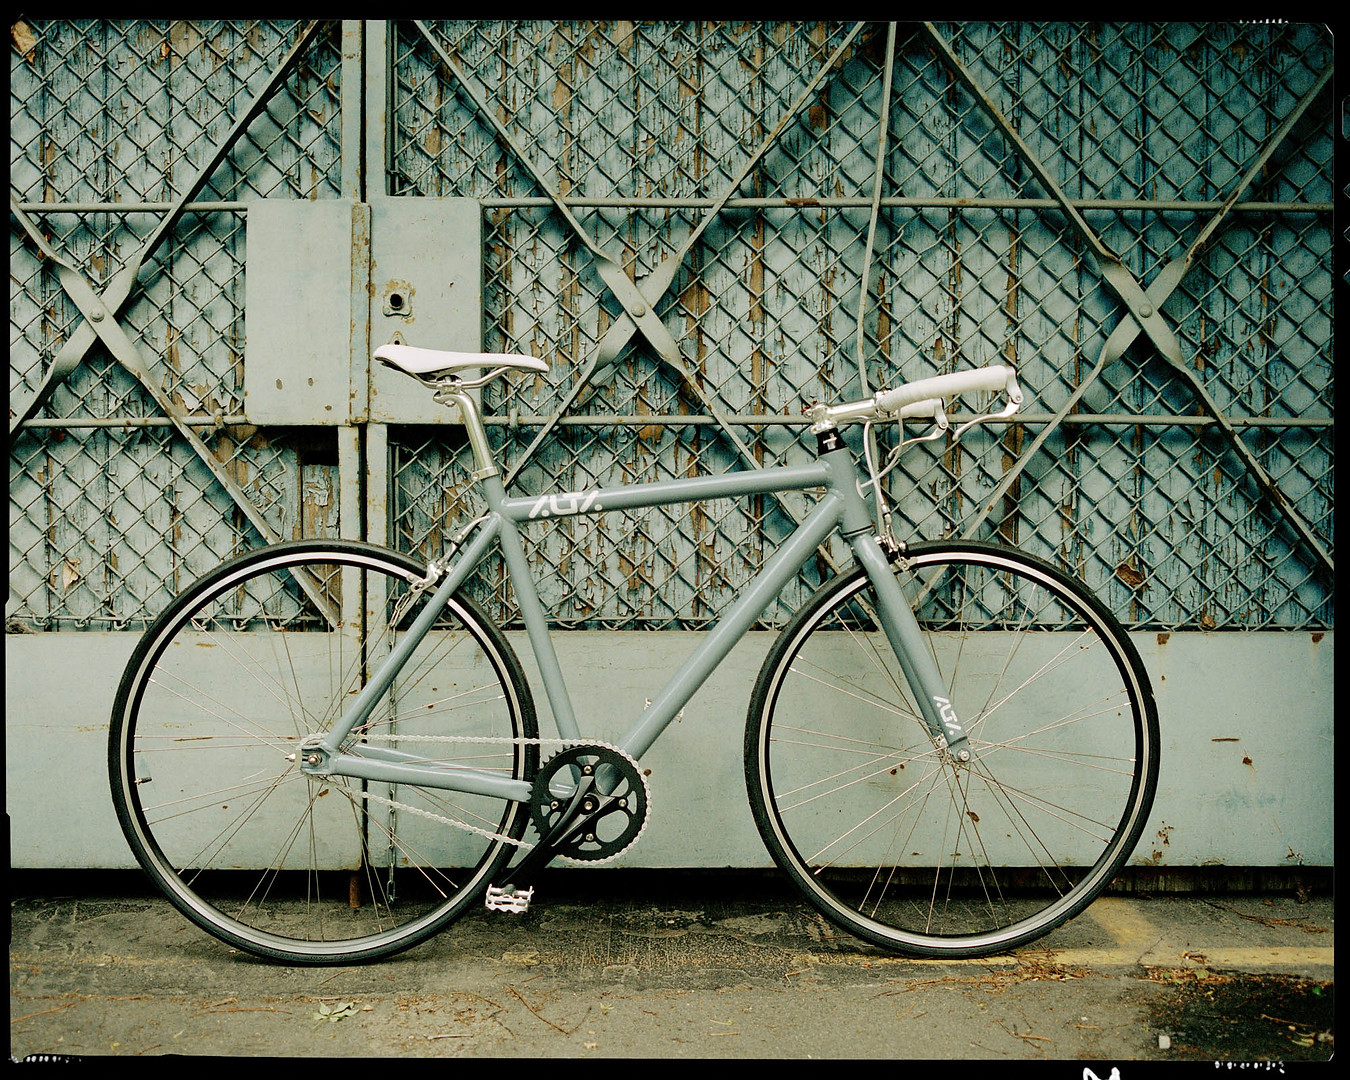 B2B  Photographer Illustration Play Conseptual Photo  Environmental Magazine Alta Bike Urban Biking Shopping Product